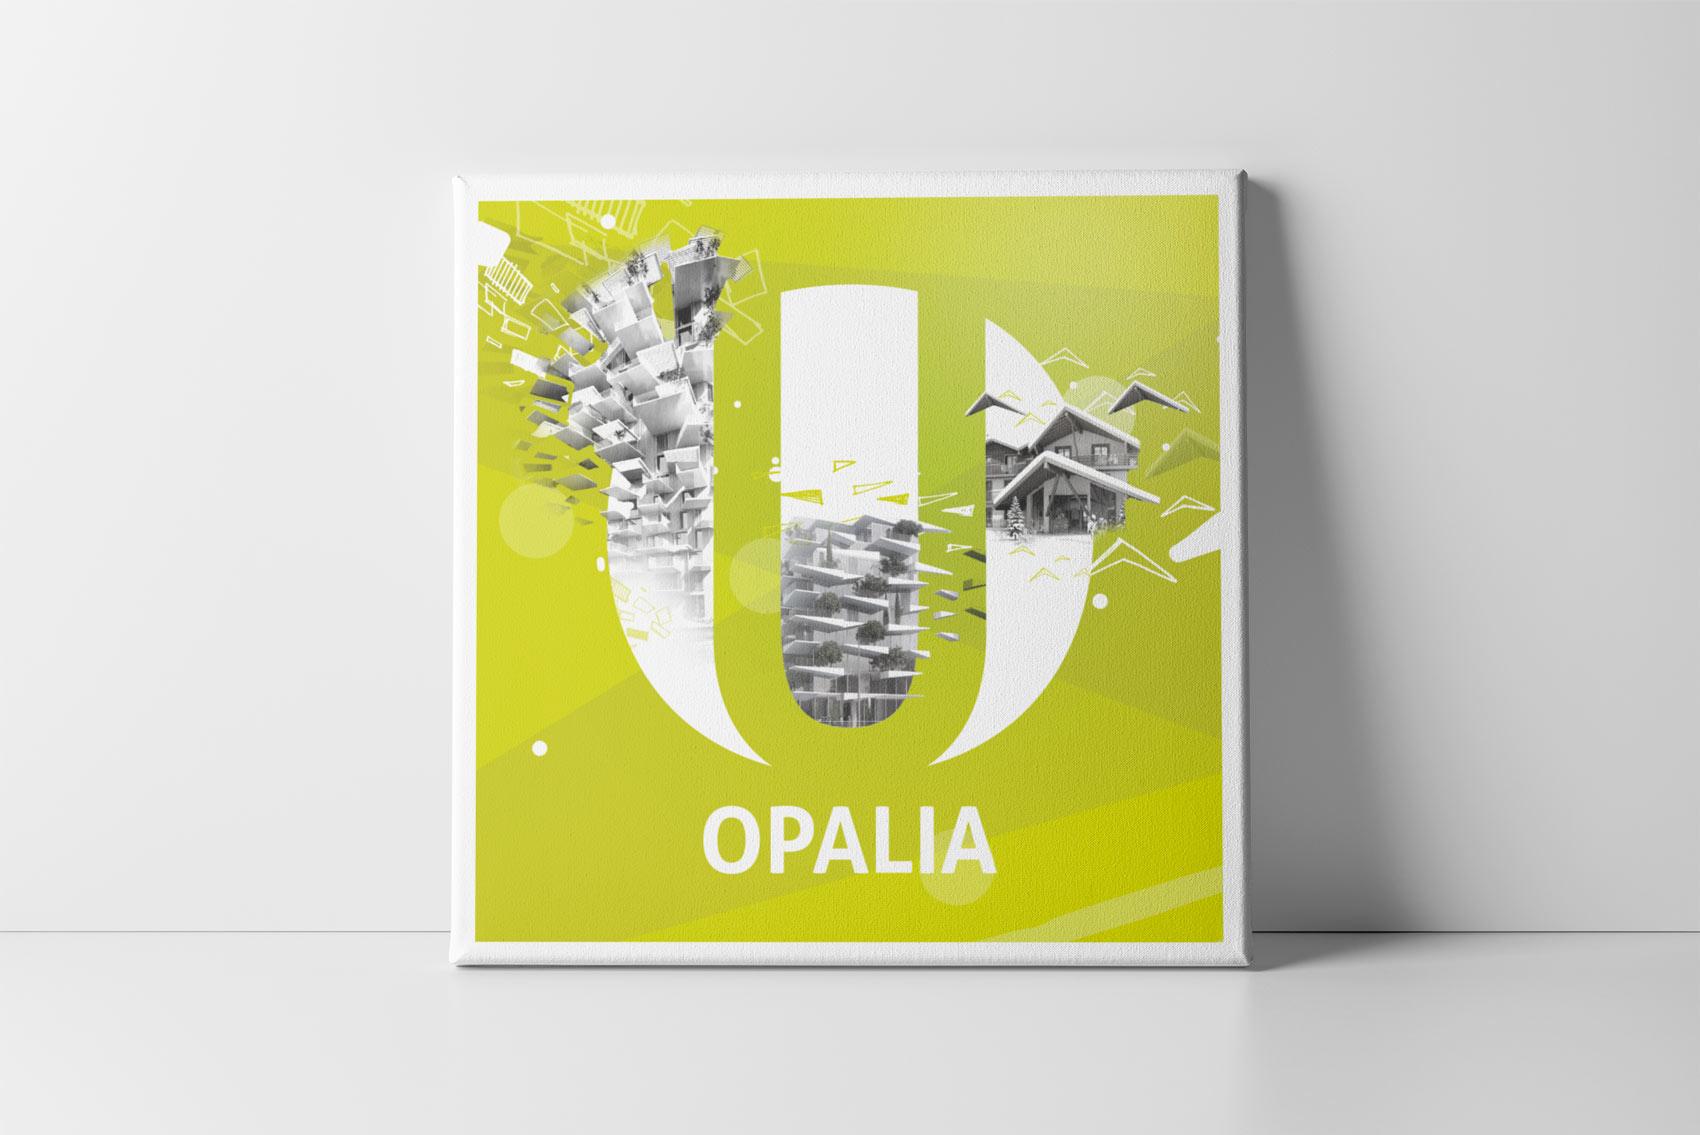 Hien Artwork x Opalia